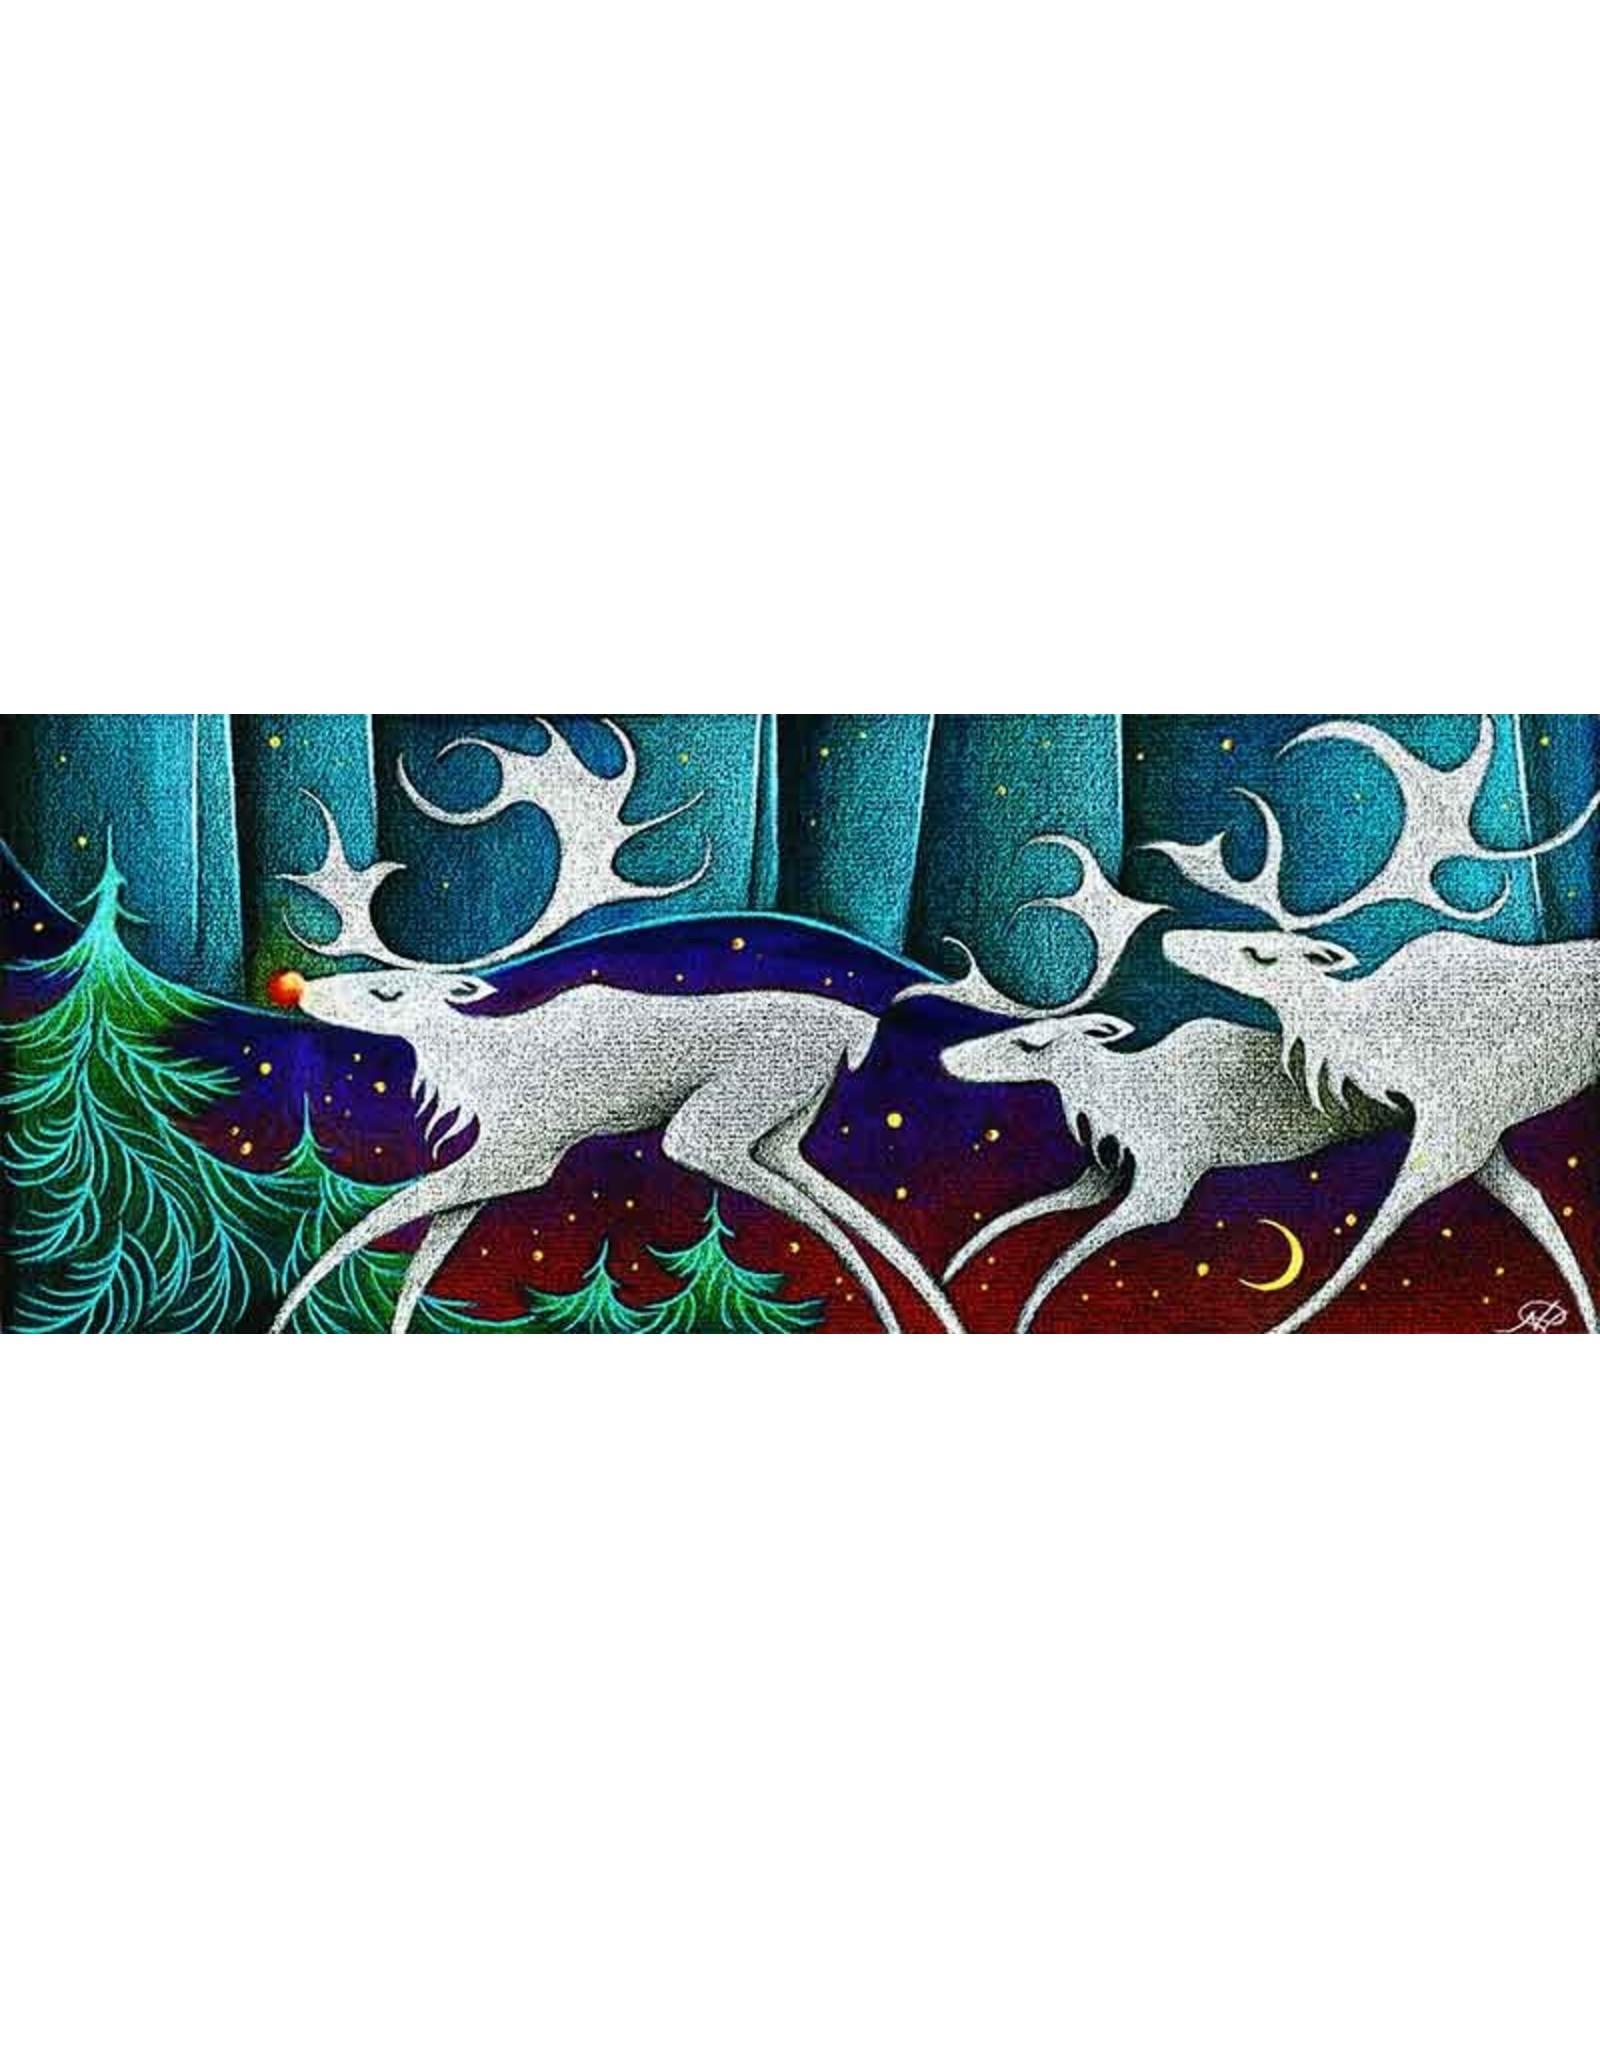 Nathalie Parenteau Rudolph the Red Nose Caribou (art card) | Nathalie Parenteau